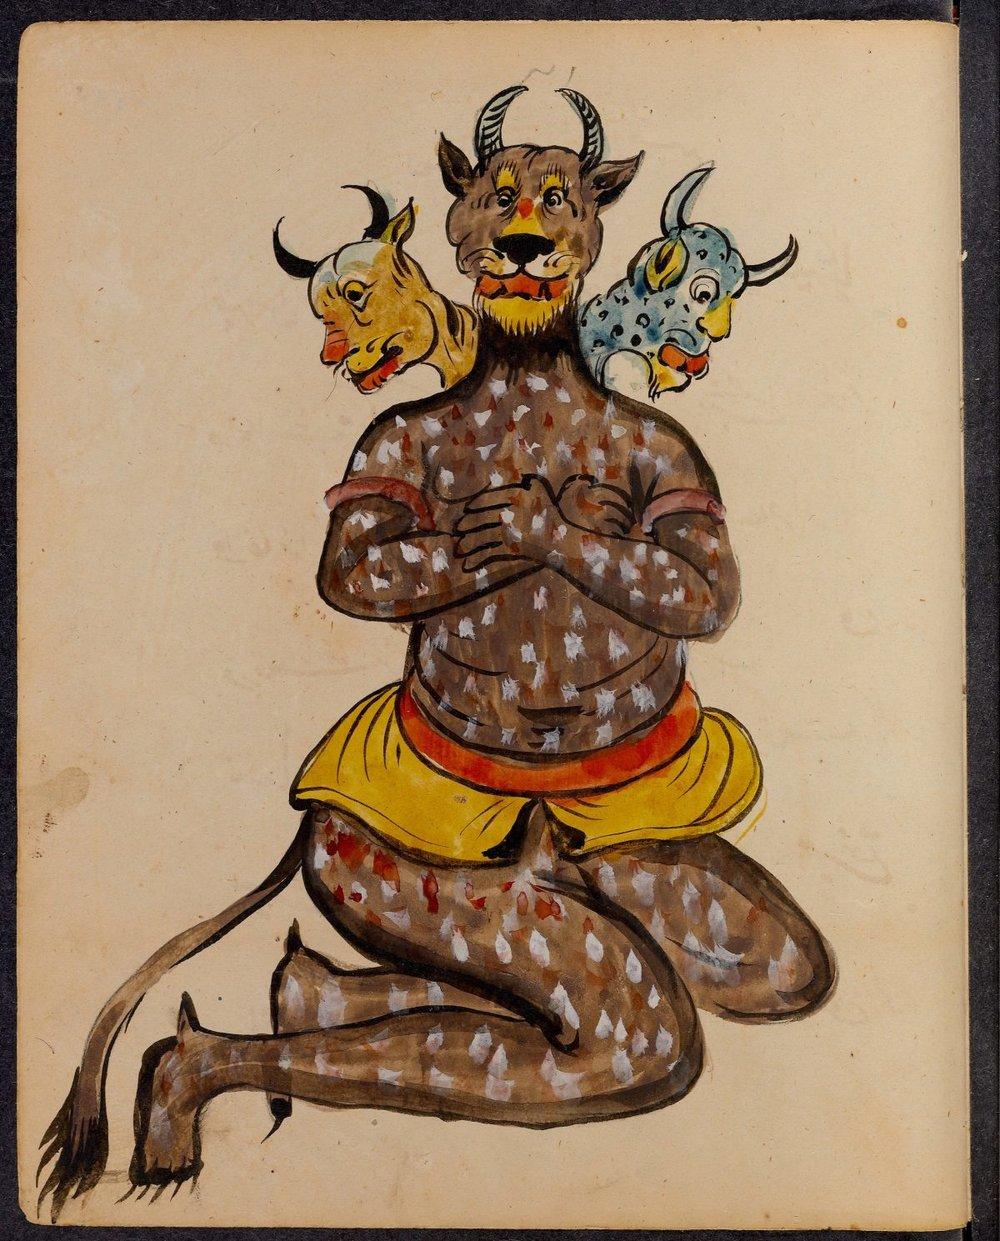 Demons-iran-17-1200x1489.jpg